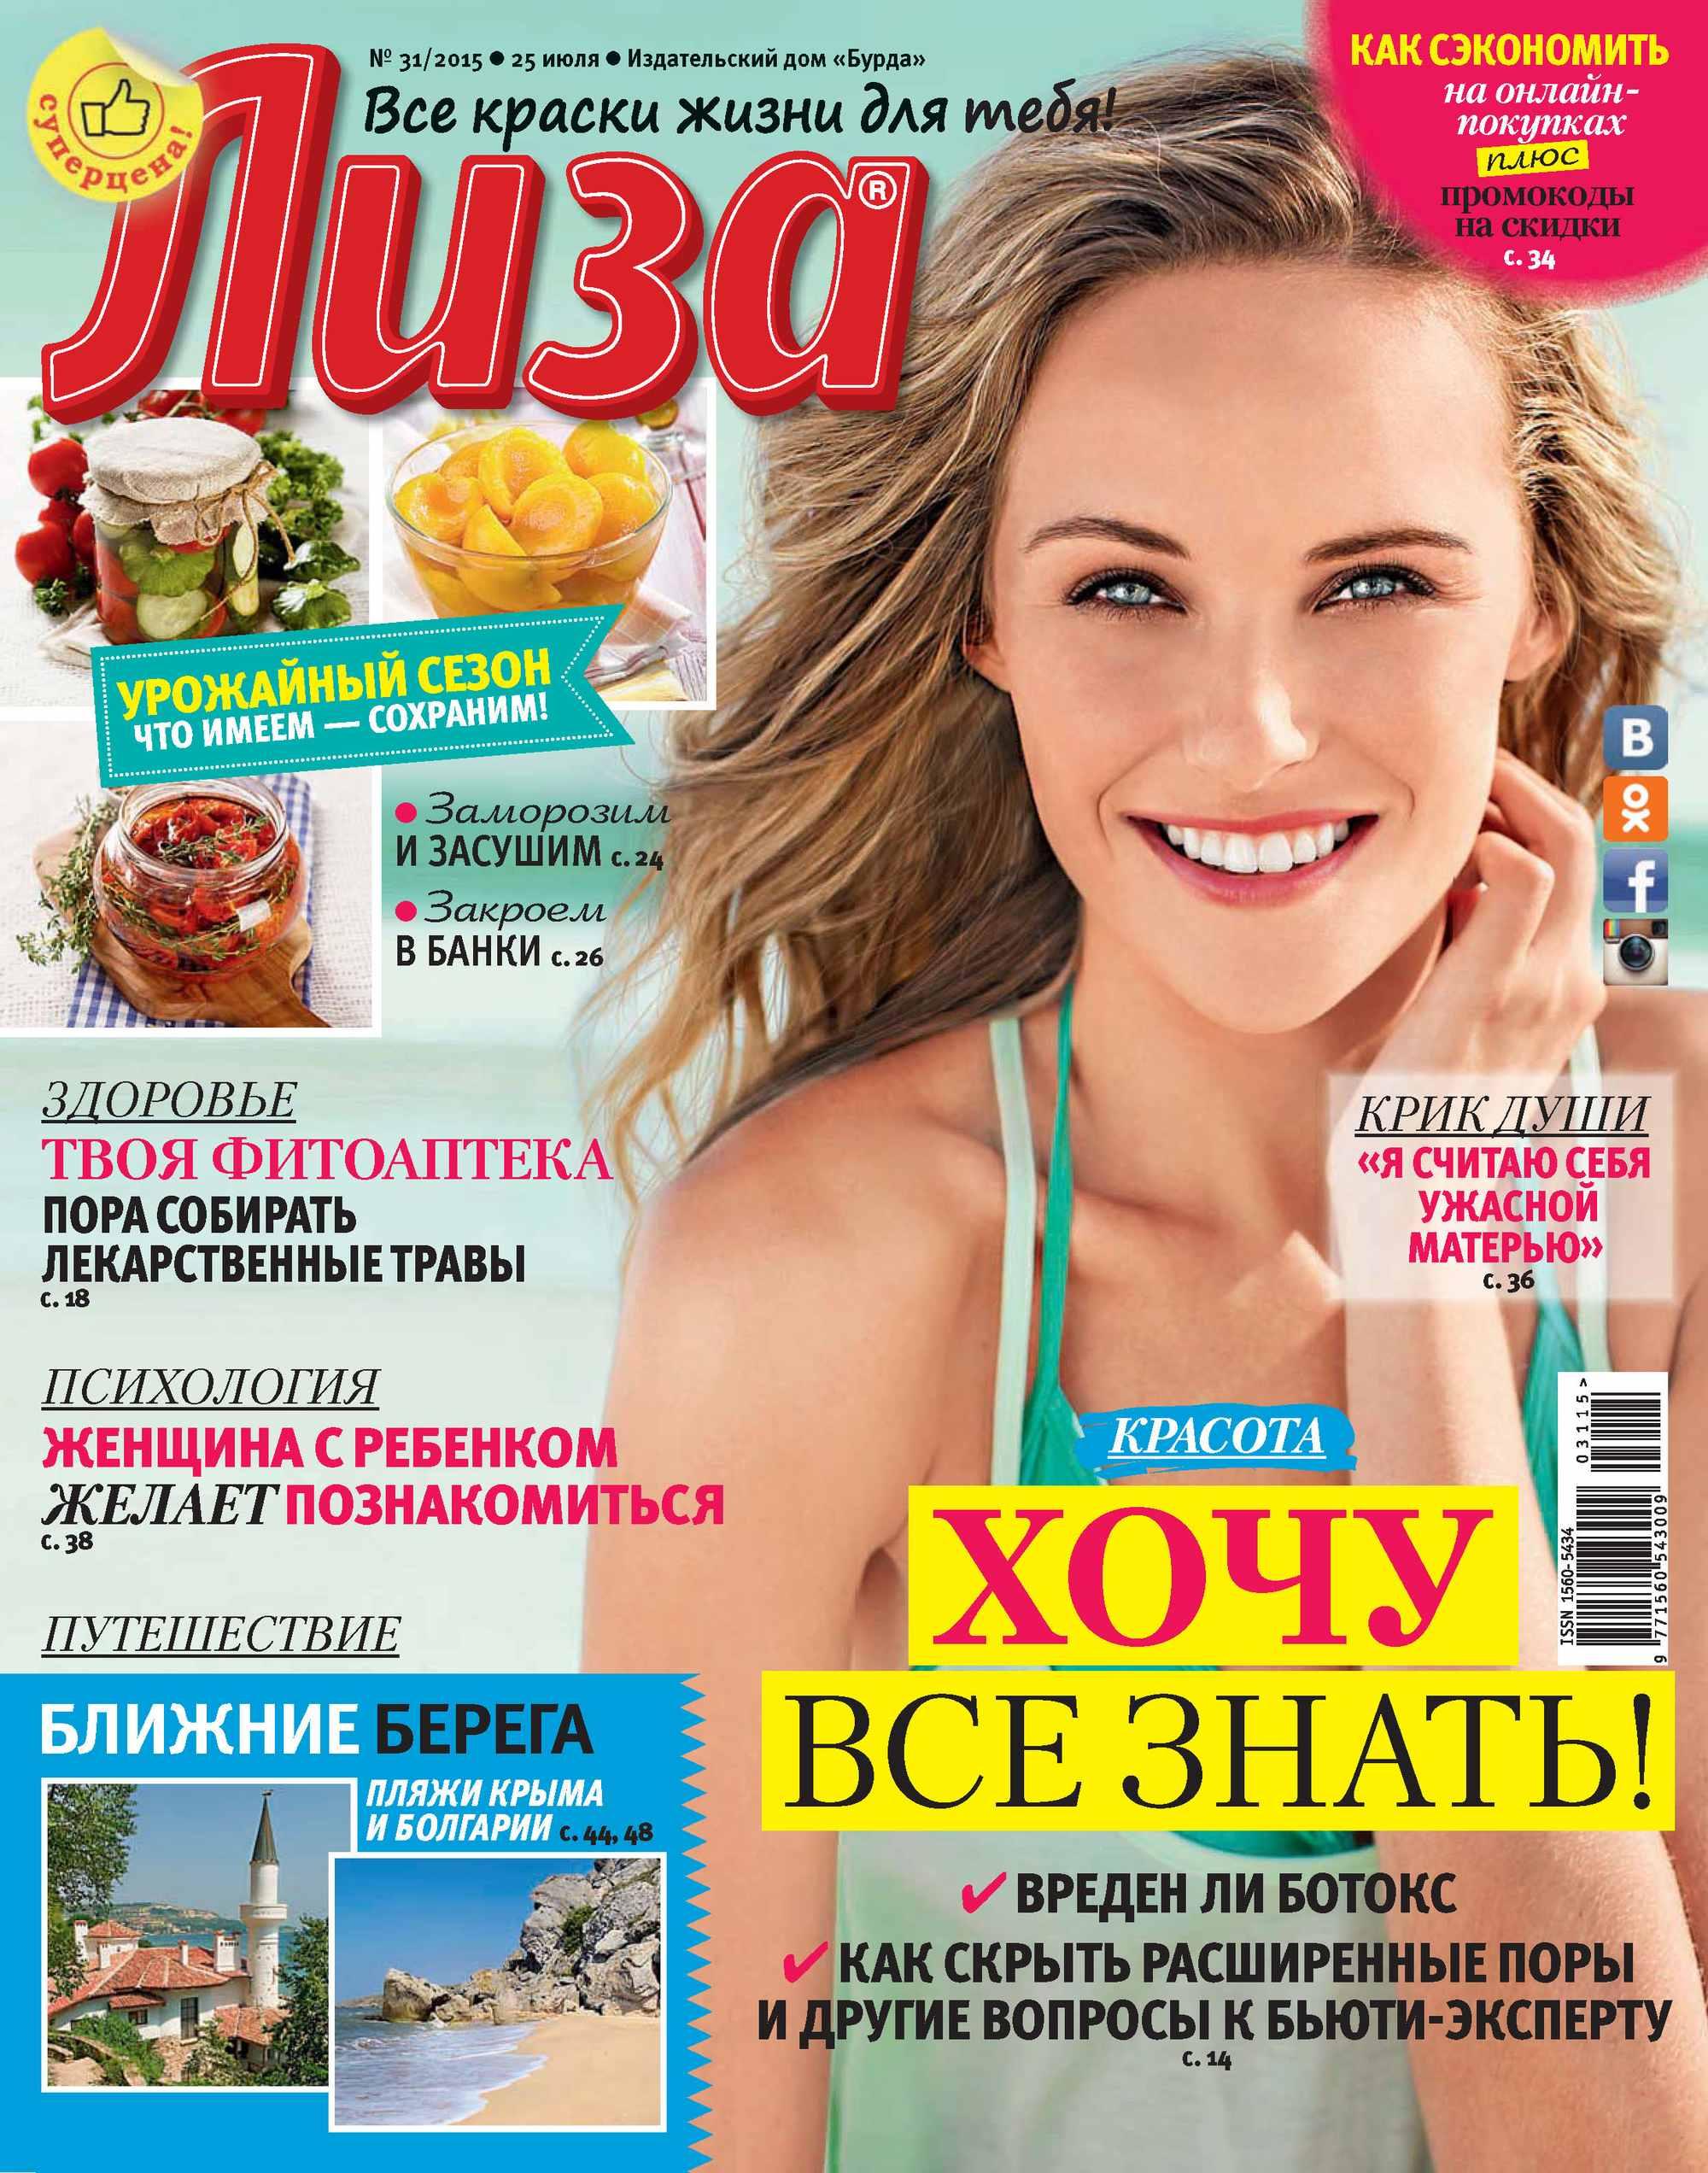 ИД «Бурда» Журнал «Лиза» №31/2015 ид бурда журнал лиза 47 2015